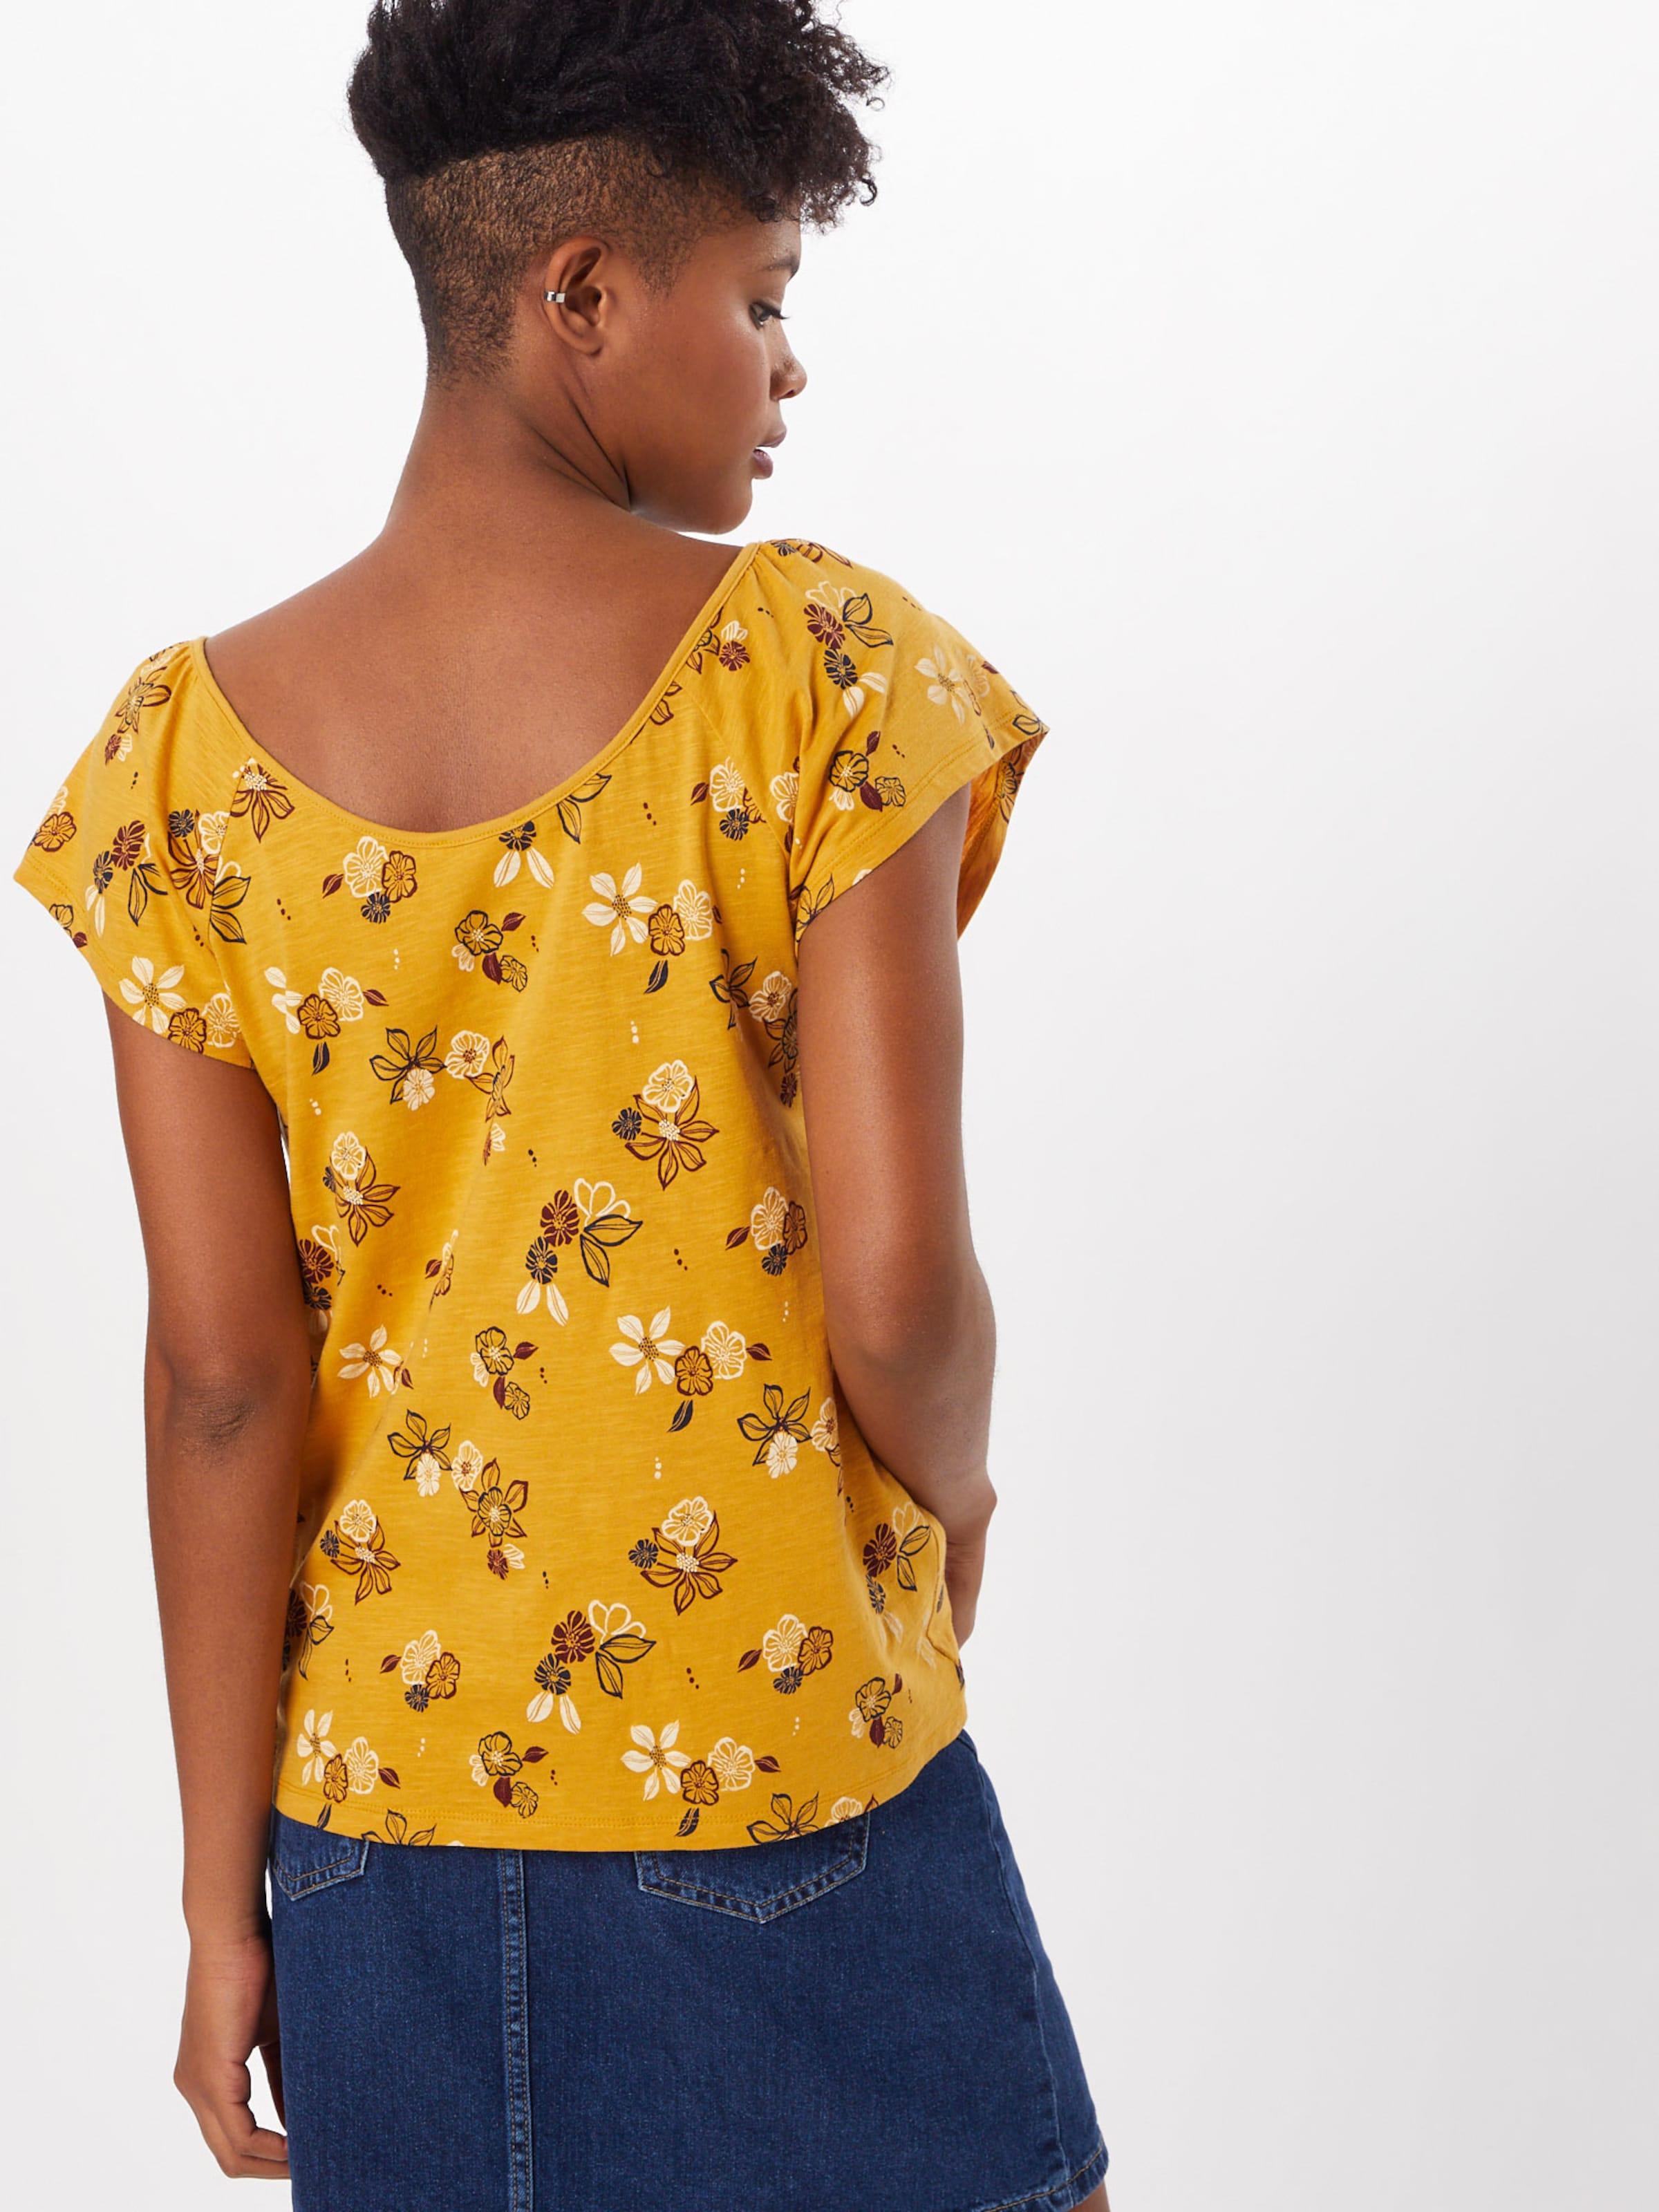 Tee' Aw Shirt 'aop In Goldgelb Esprit PTOZkliuwX